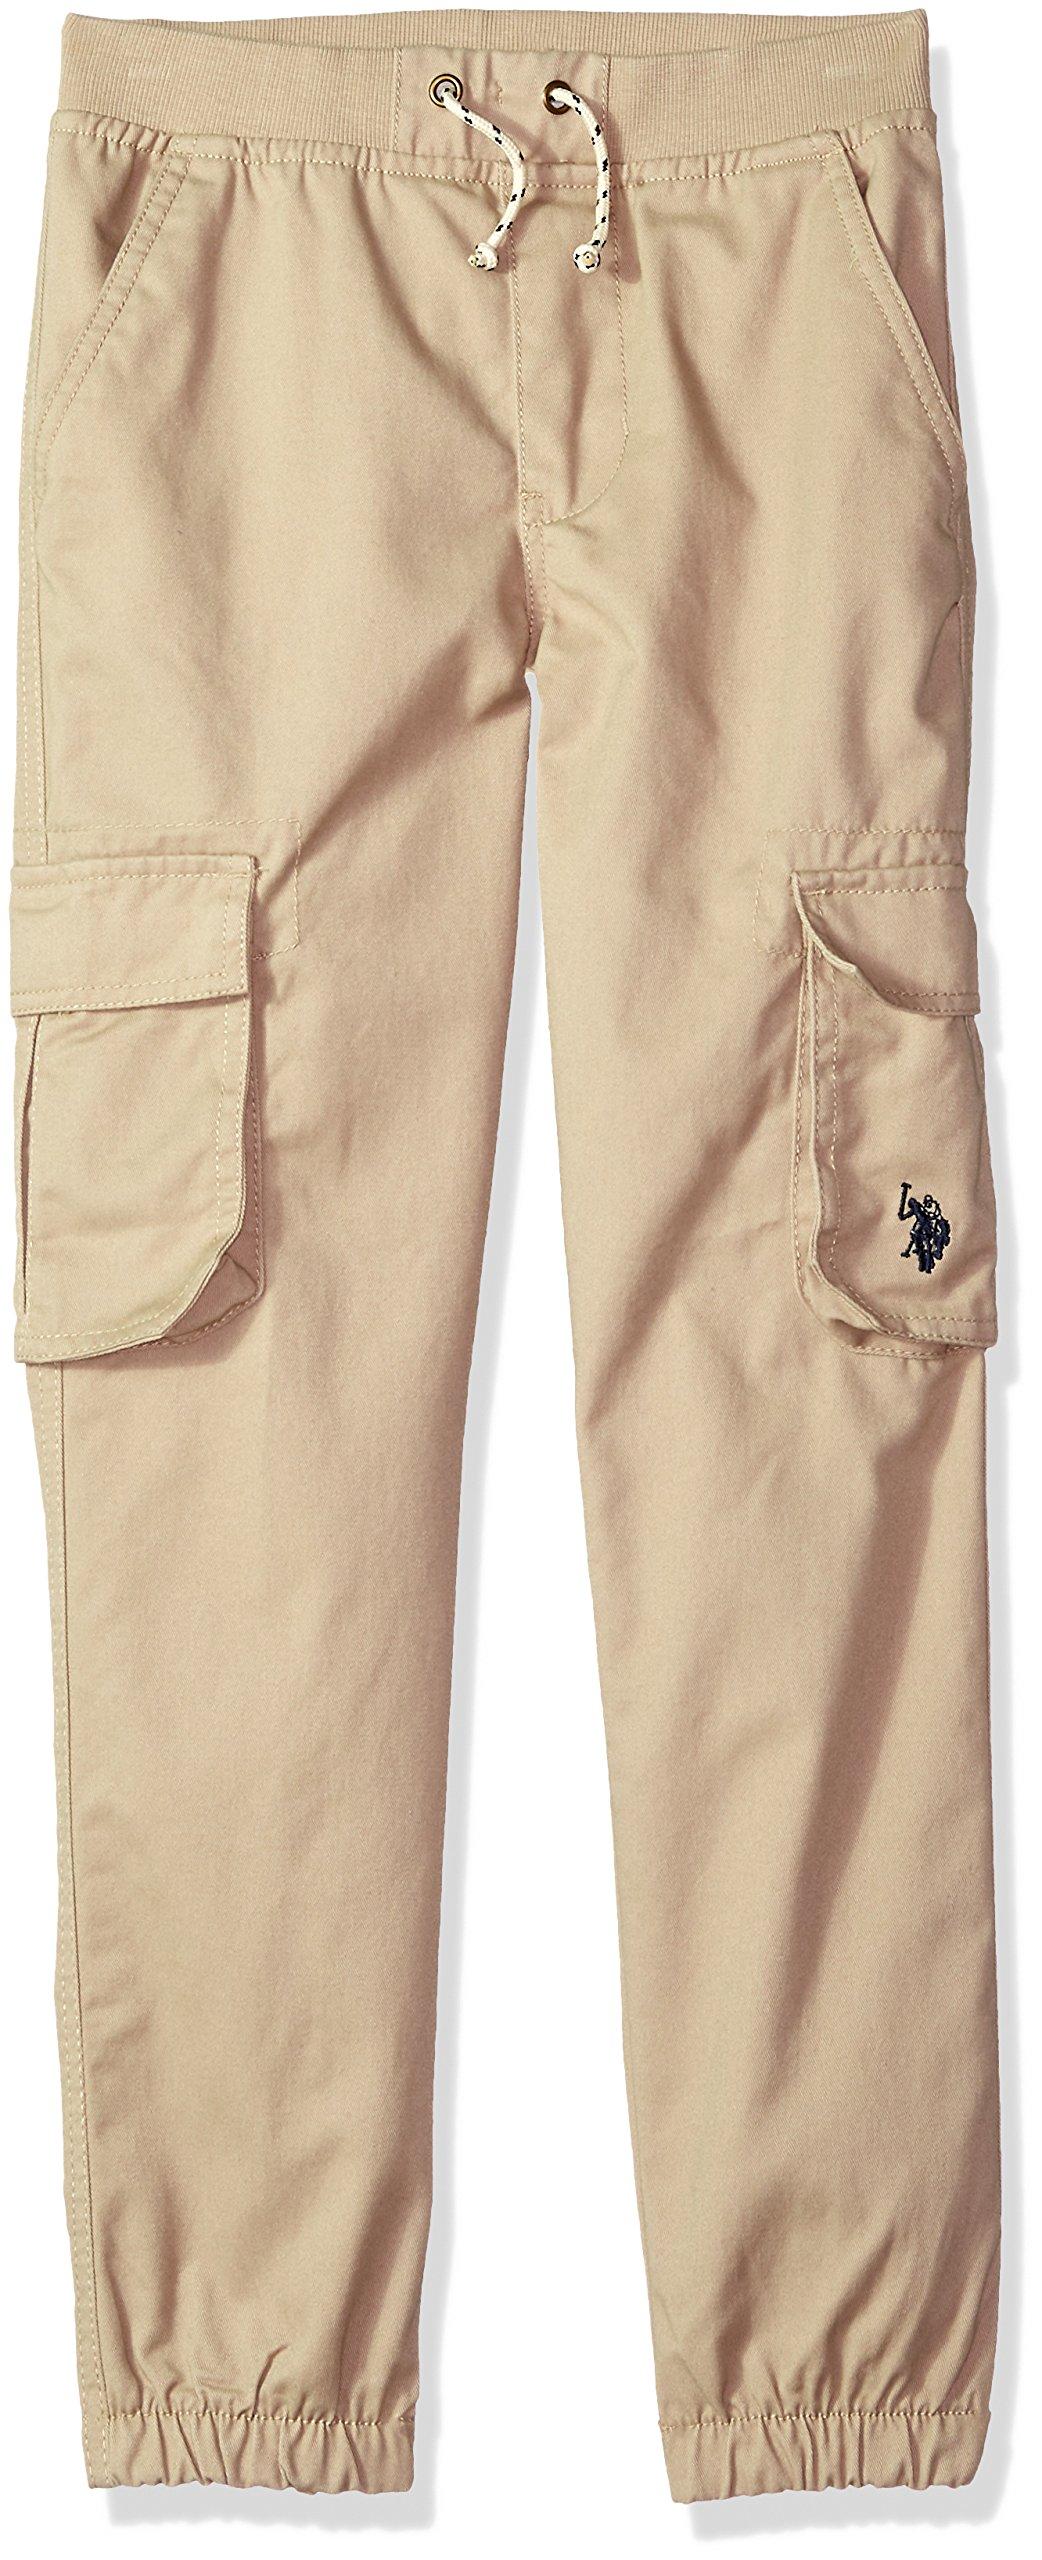 U.S. Polo Assn. Toddler Boys' Twill Jogger Pant, Ribbed Waistband Light Khaki, 3T